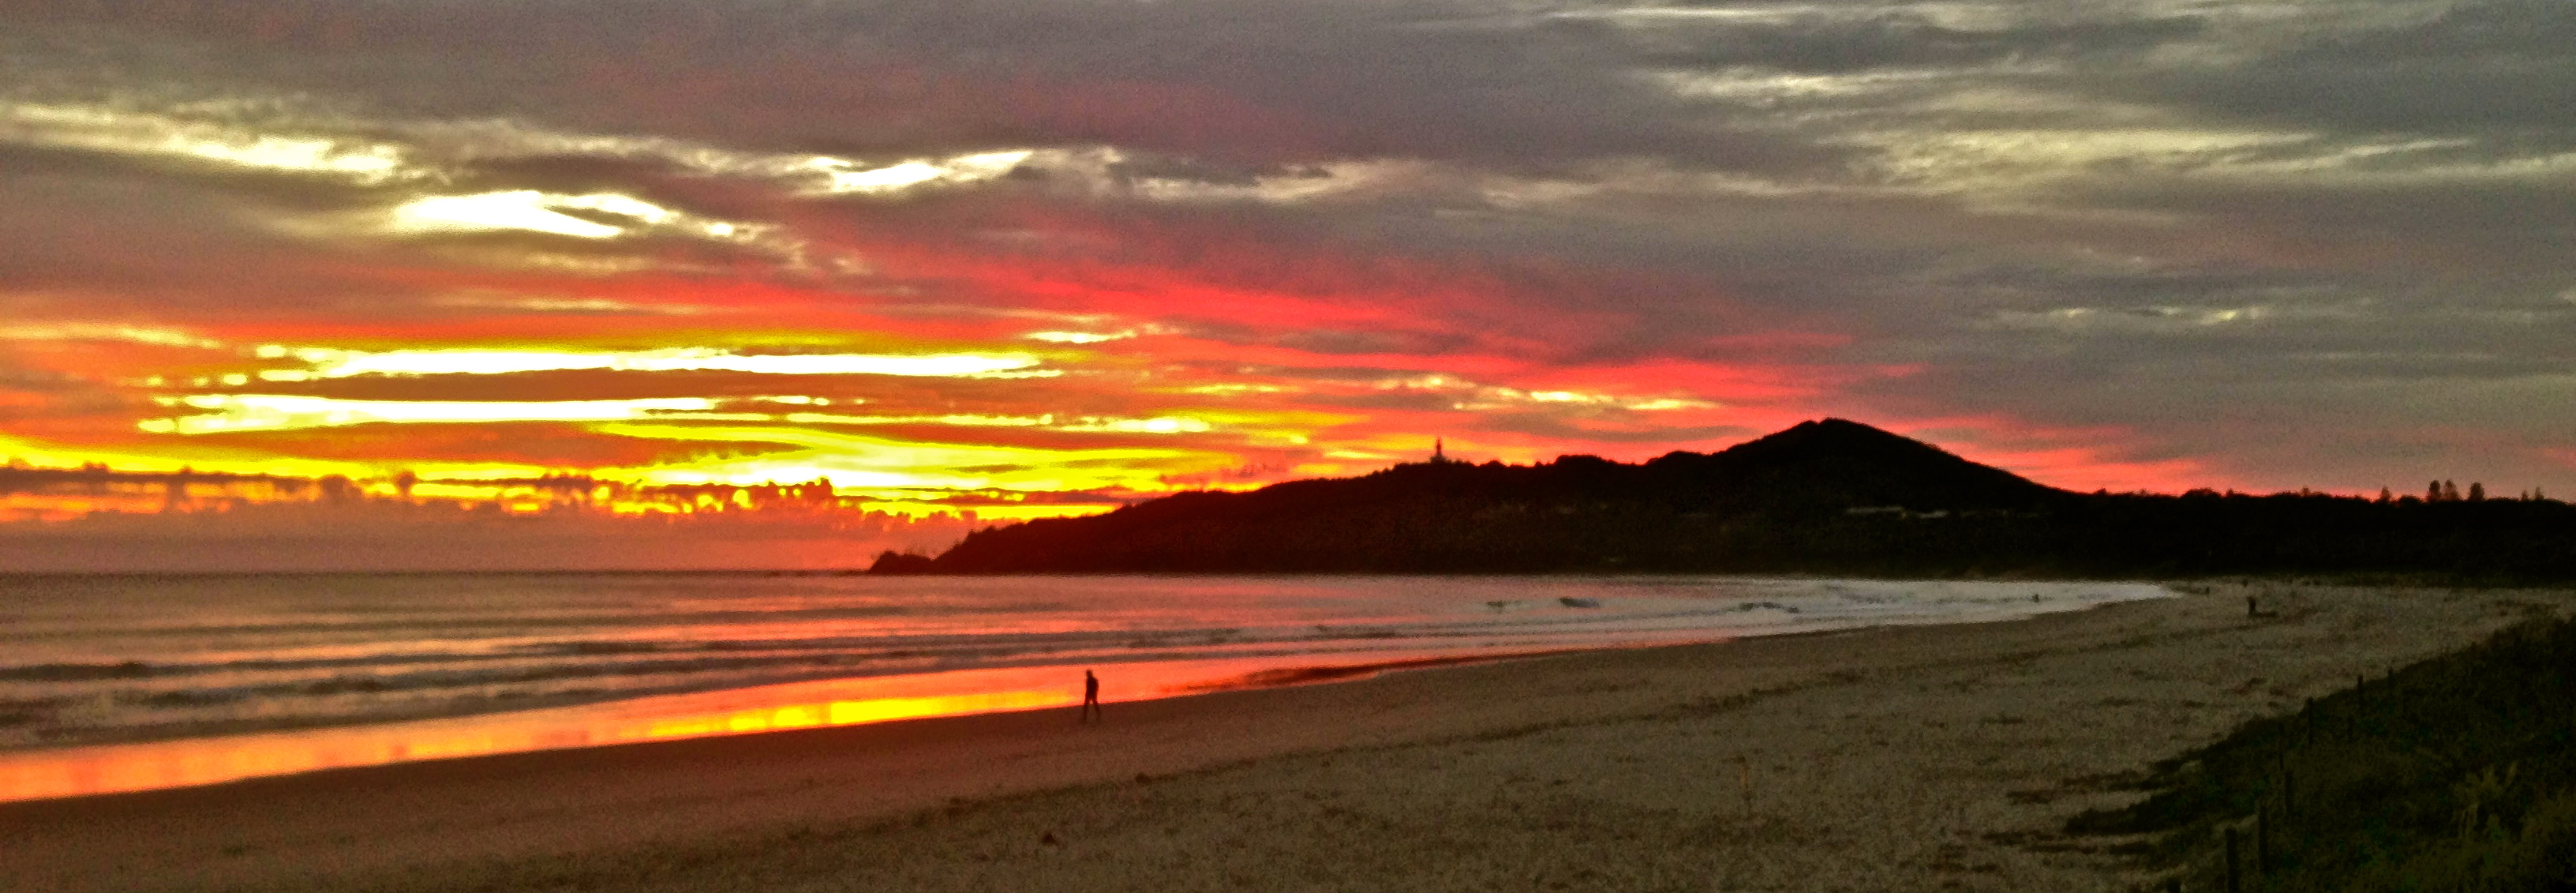 Sunrise Sea Kayak Tour